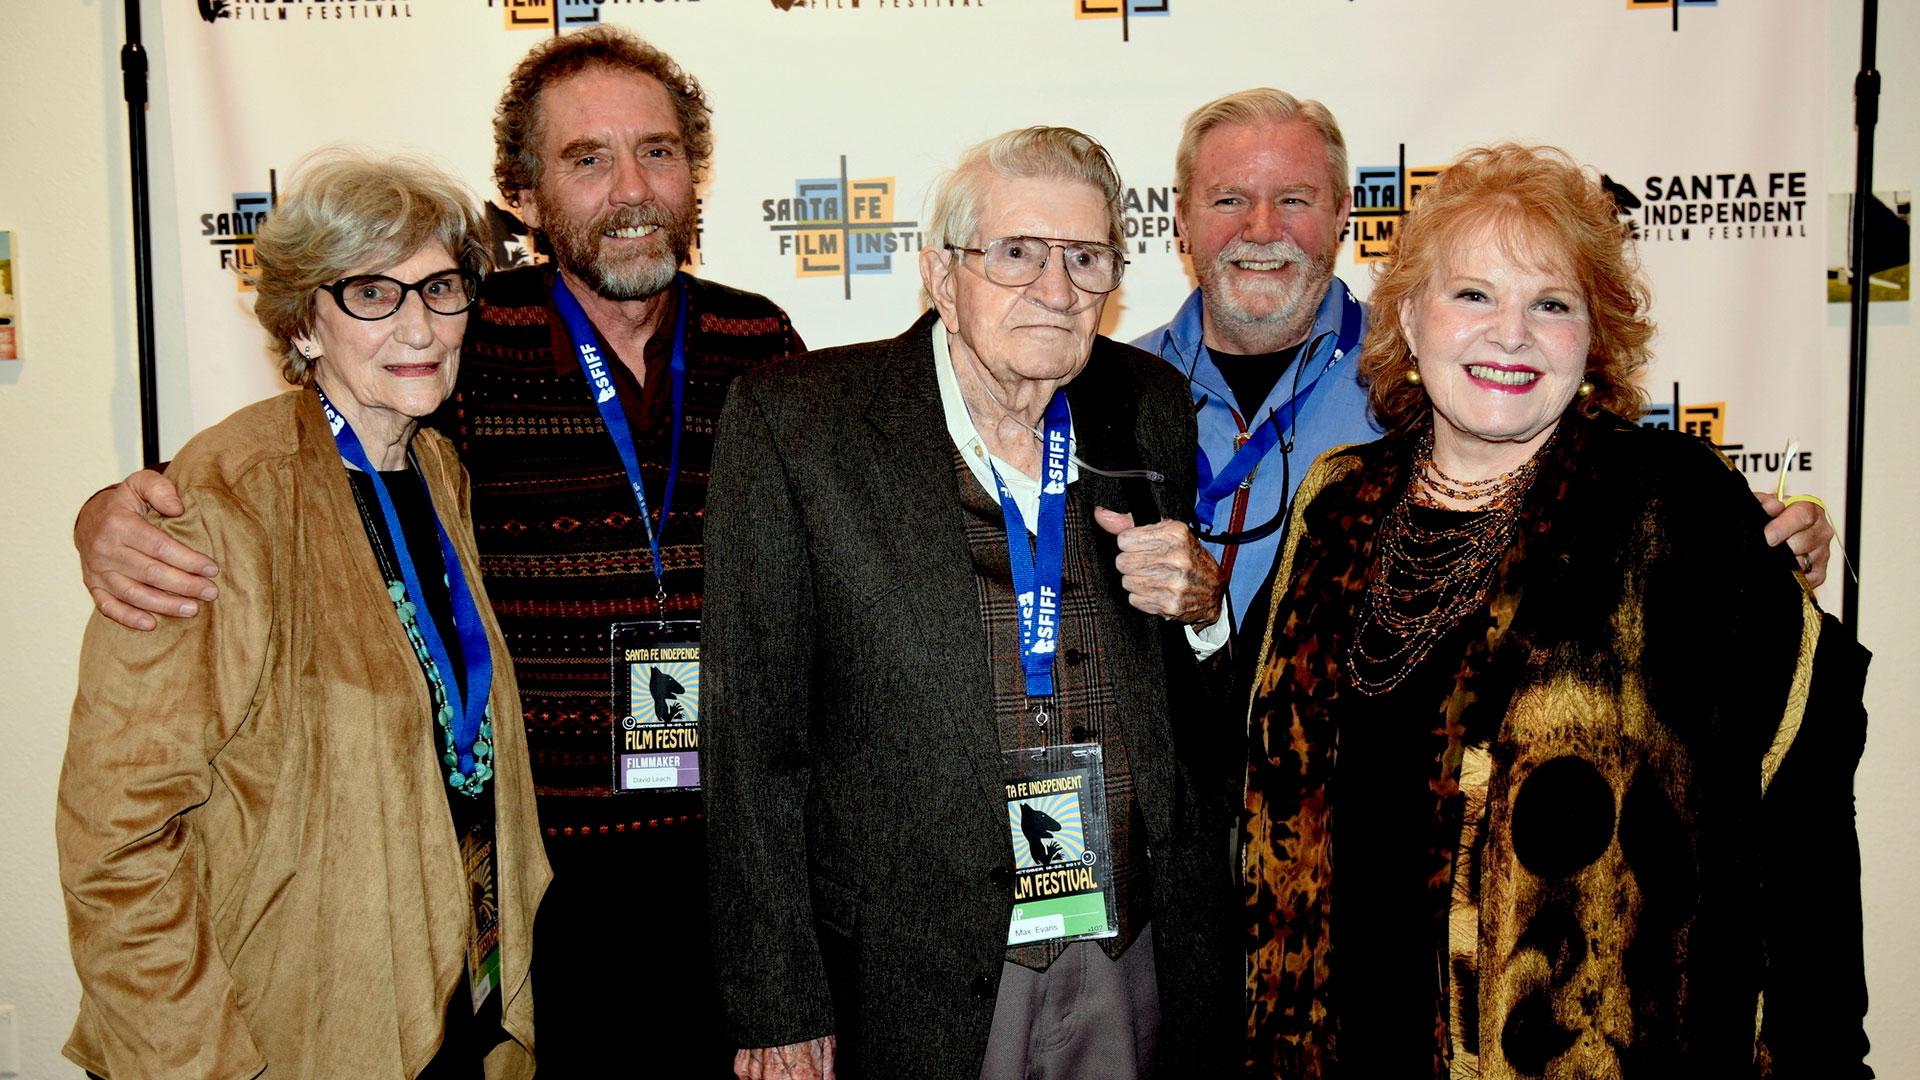 Photo Pat Evans, David Leach, Max Evans, Paul Barnes, Lorene Mills